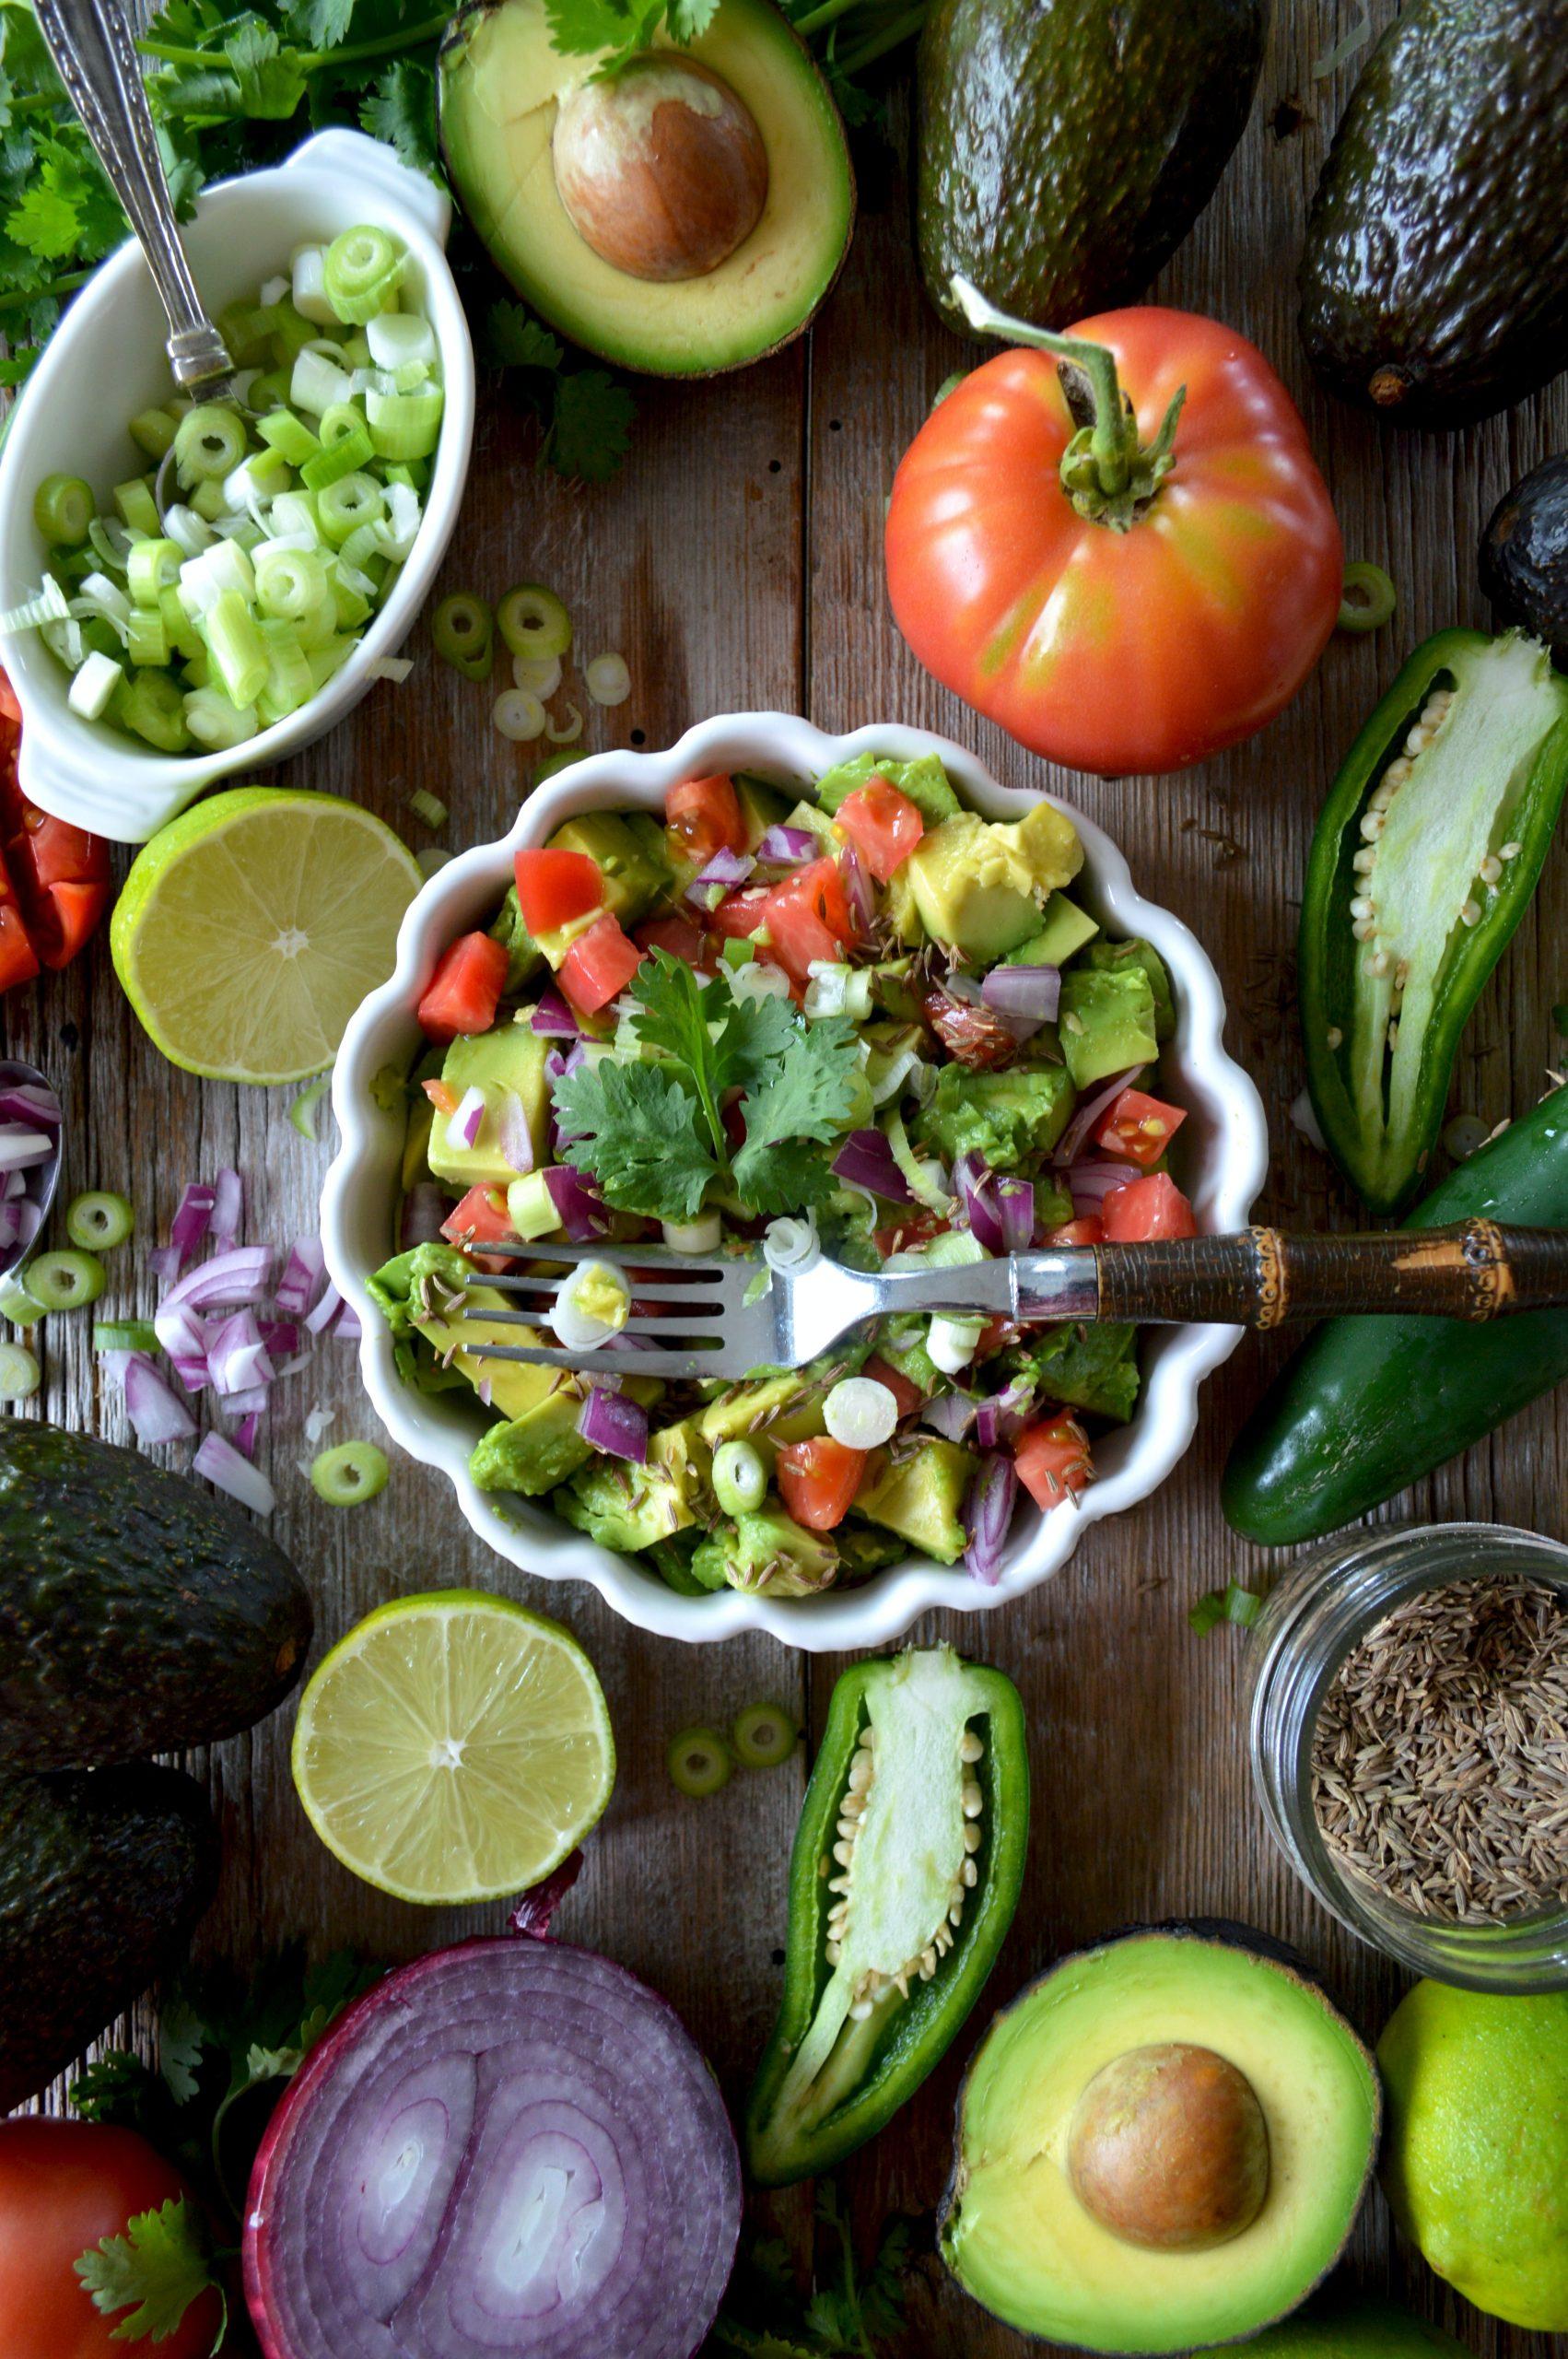 Mediterranean salad, Spanish Food, spanish cuisine, traditional spanish food, food in Spain, Spanish dishes